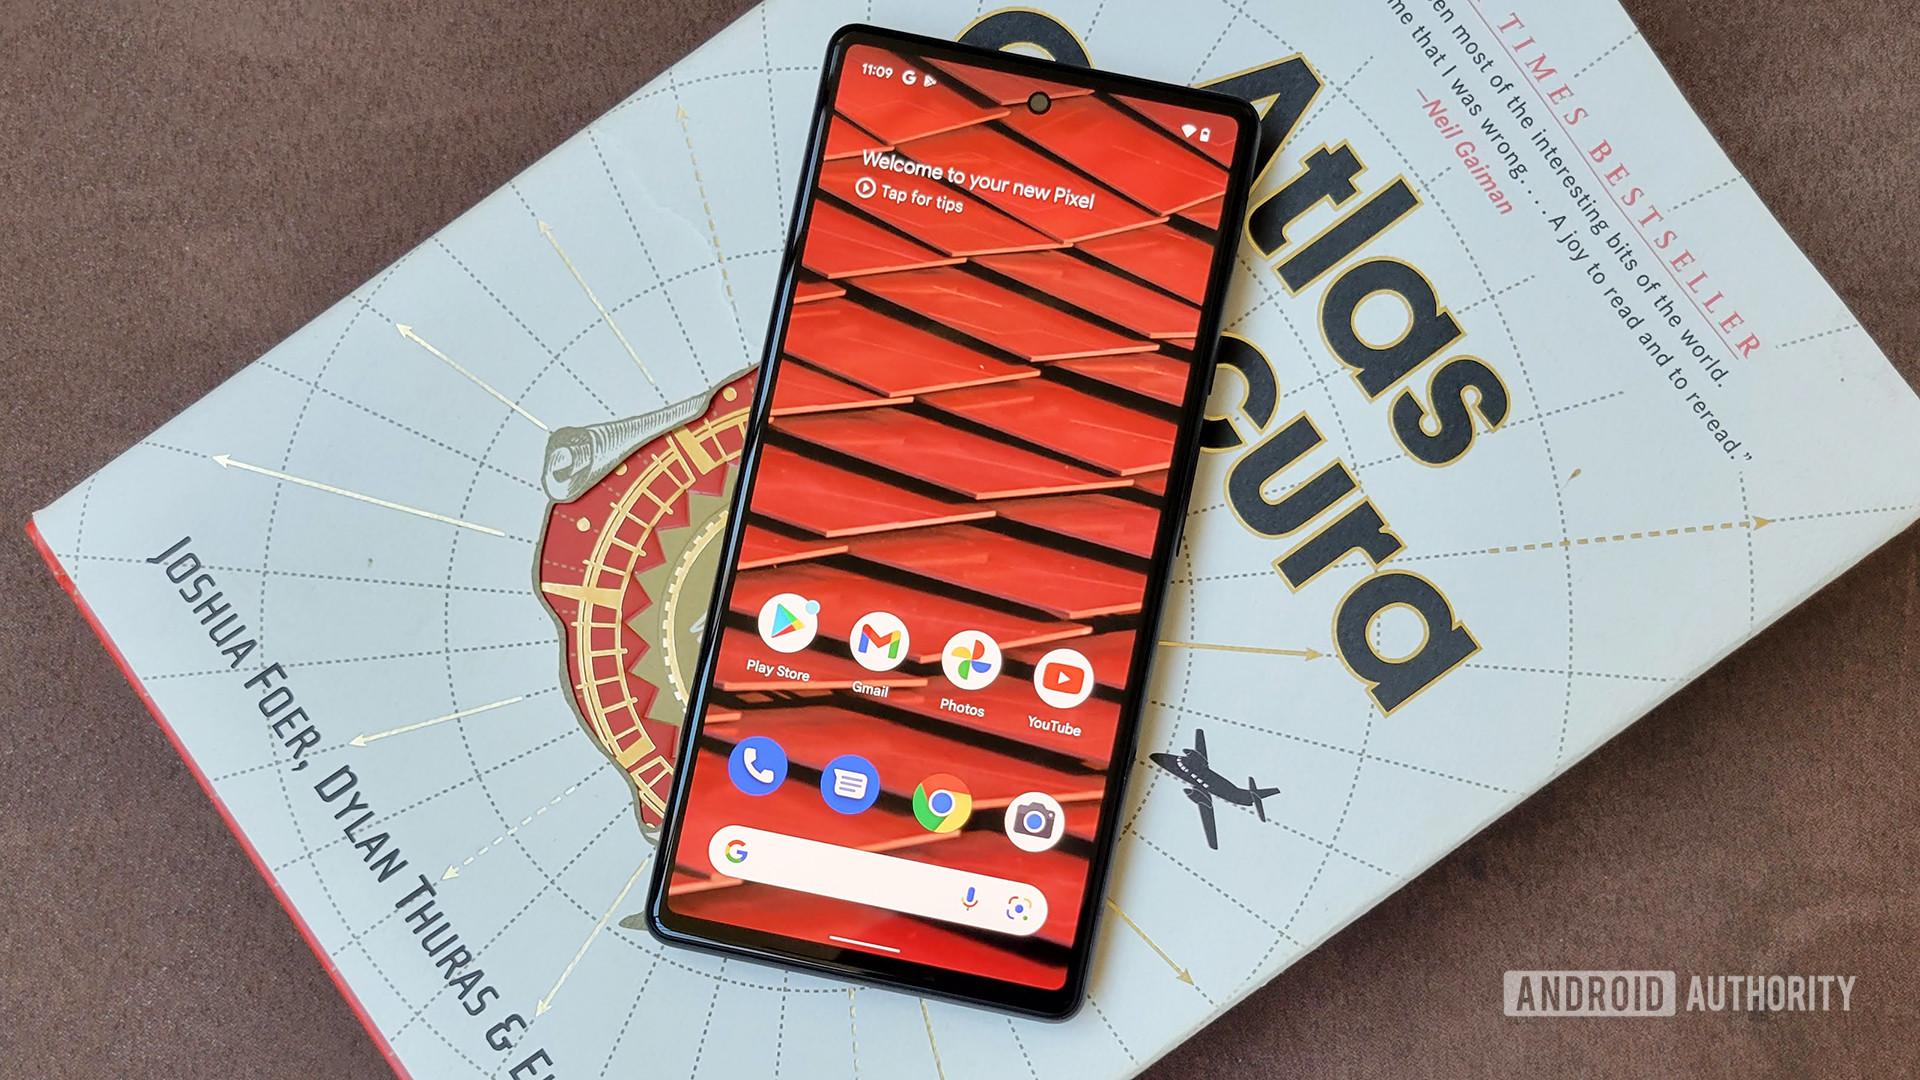 Google Pixel 6 Home Screen on Book